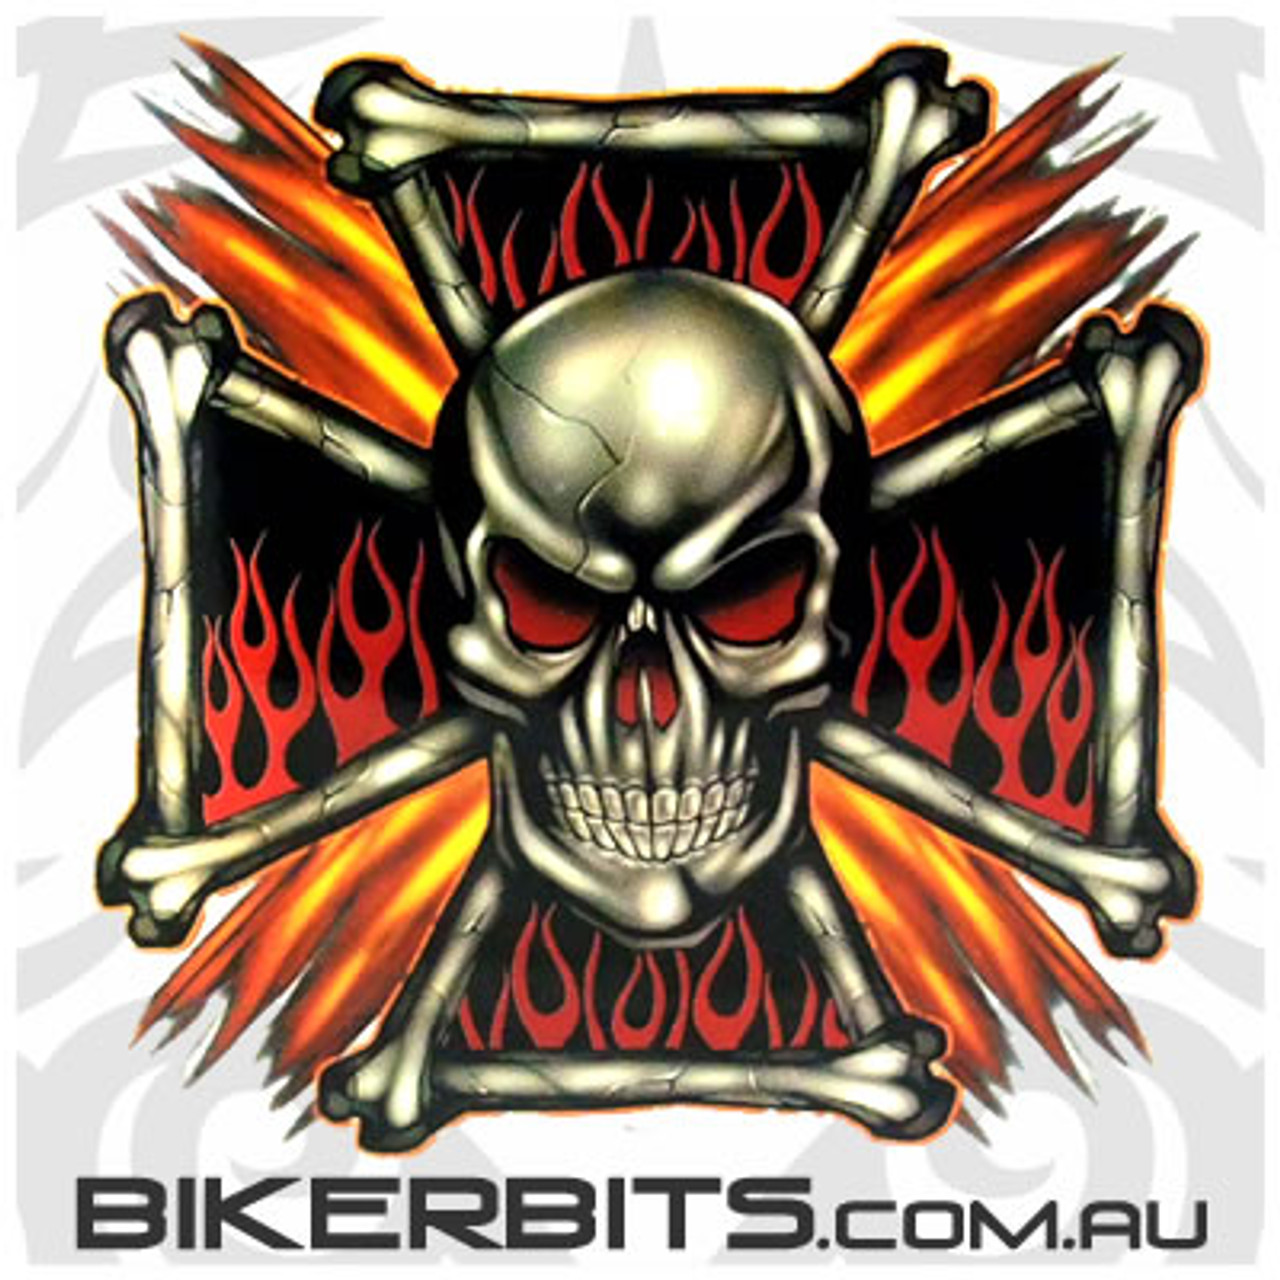 Biker Decal - Flame Cross Skull